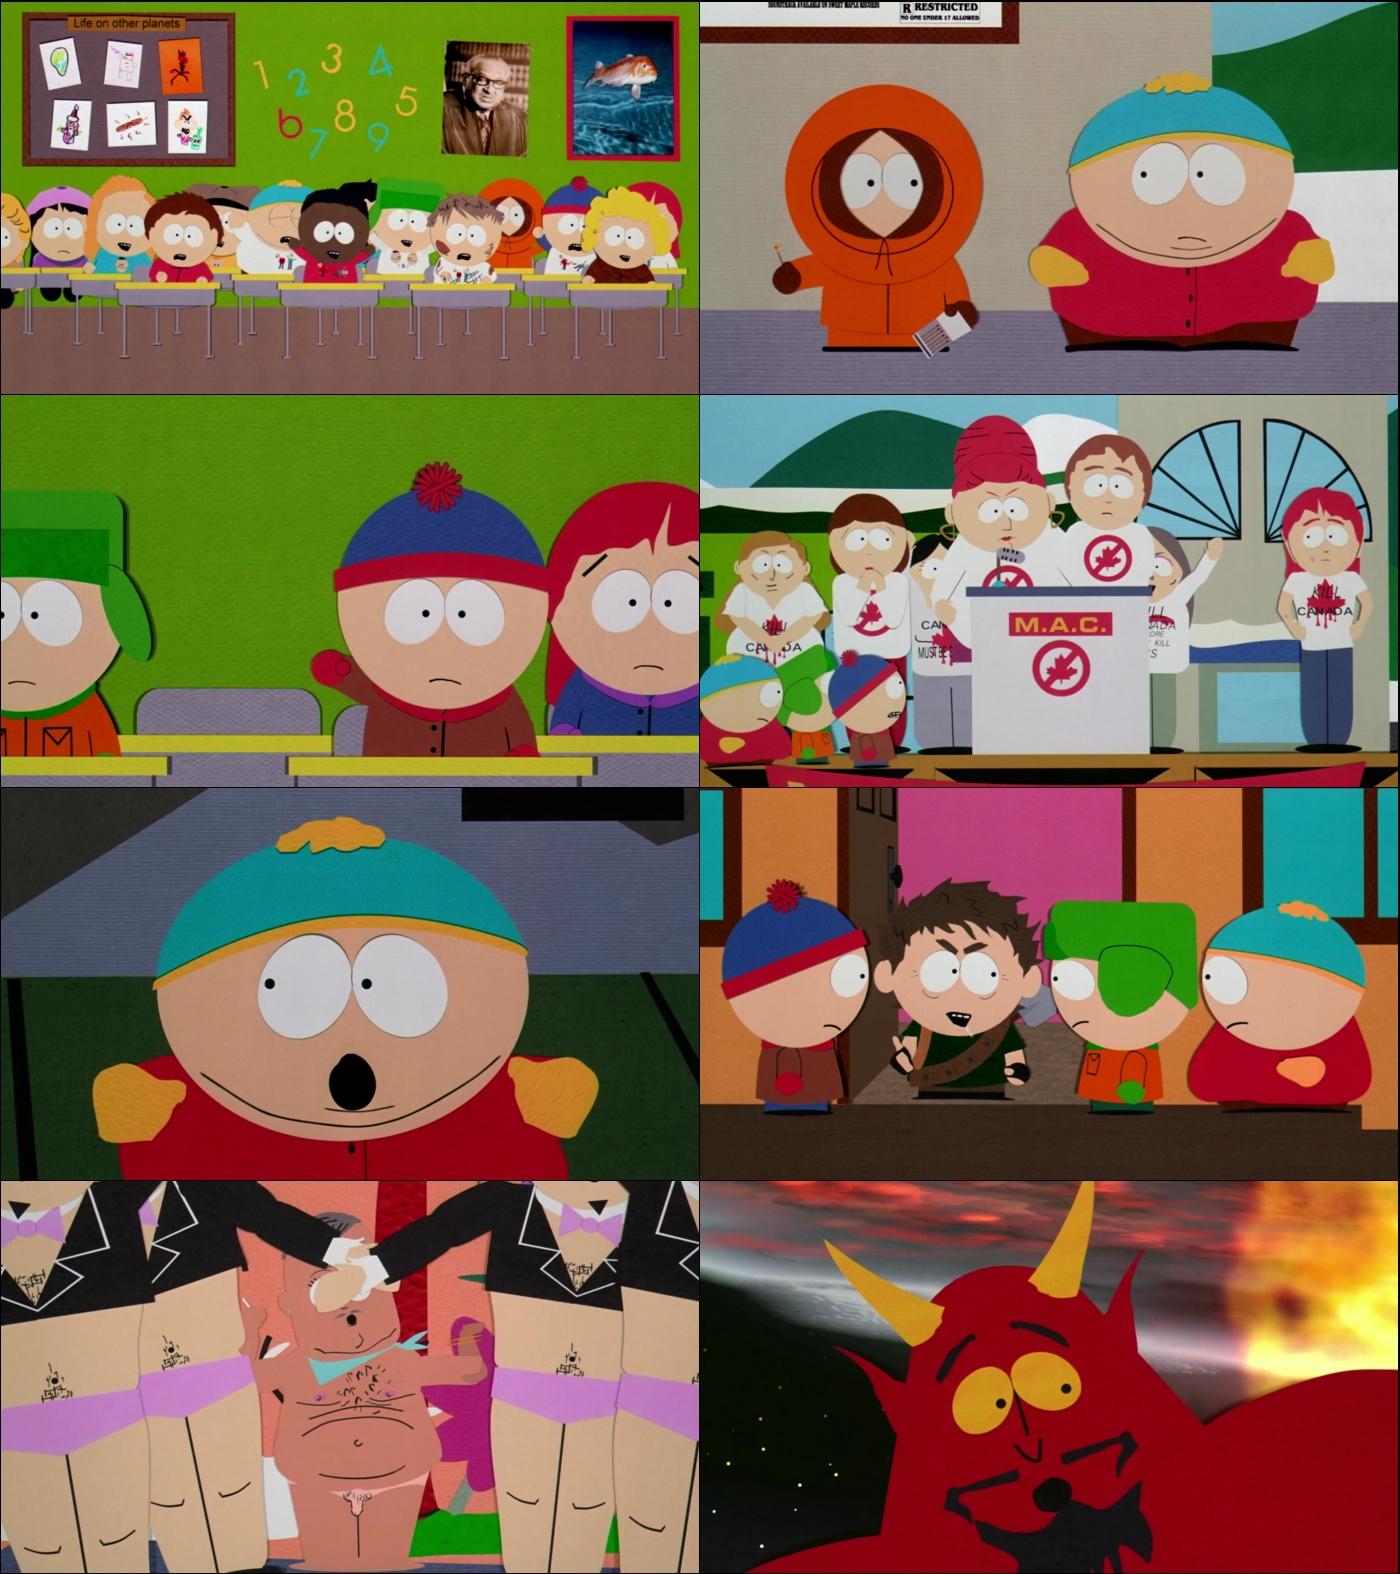 South Park La Pelicula 1080p Latino